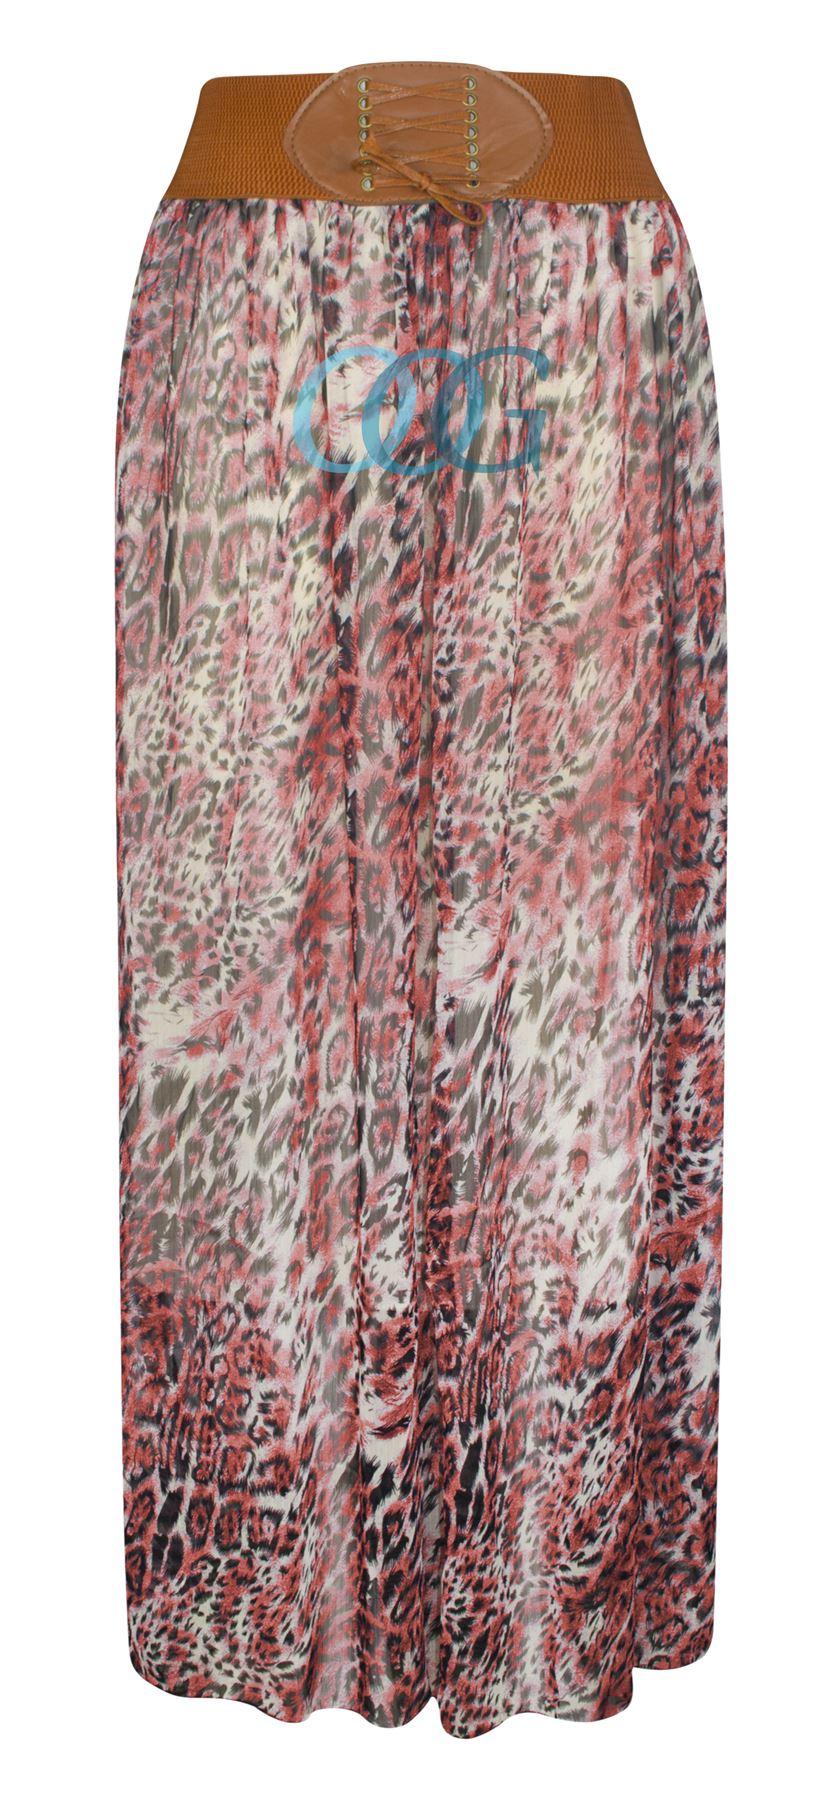 womens animal leopard floral print sheer chiffon